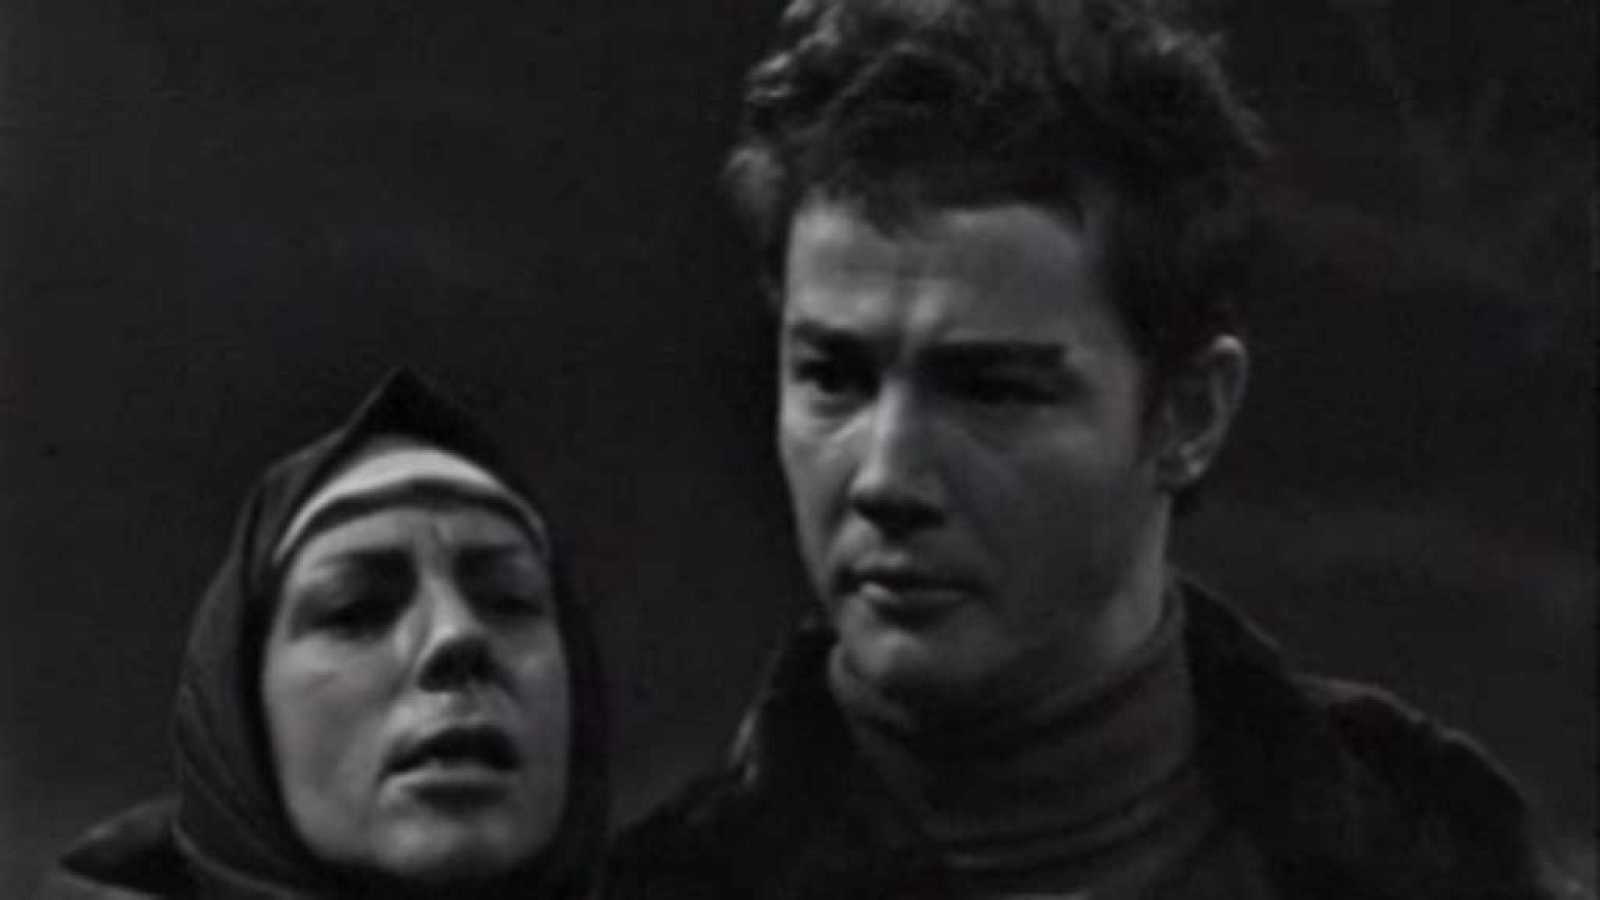 Teatro - La vida es sueño (auto sacramental) (1965)